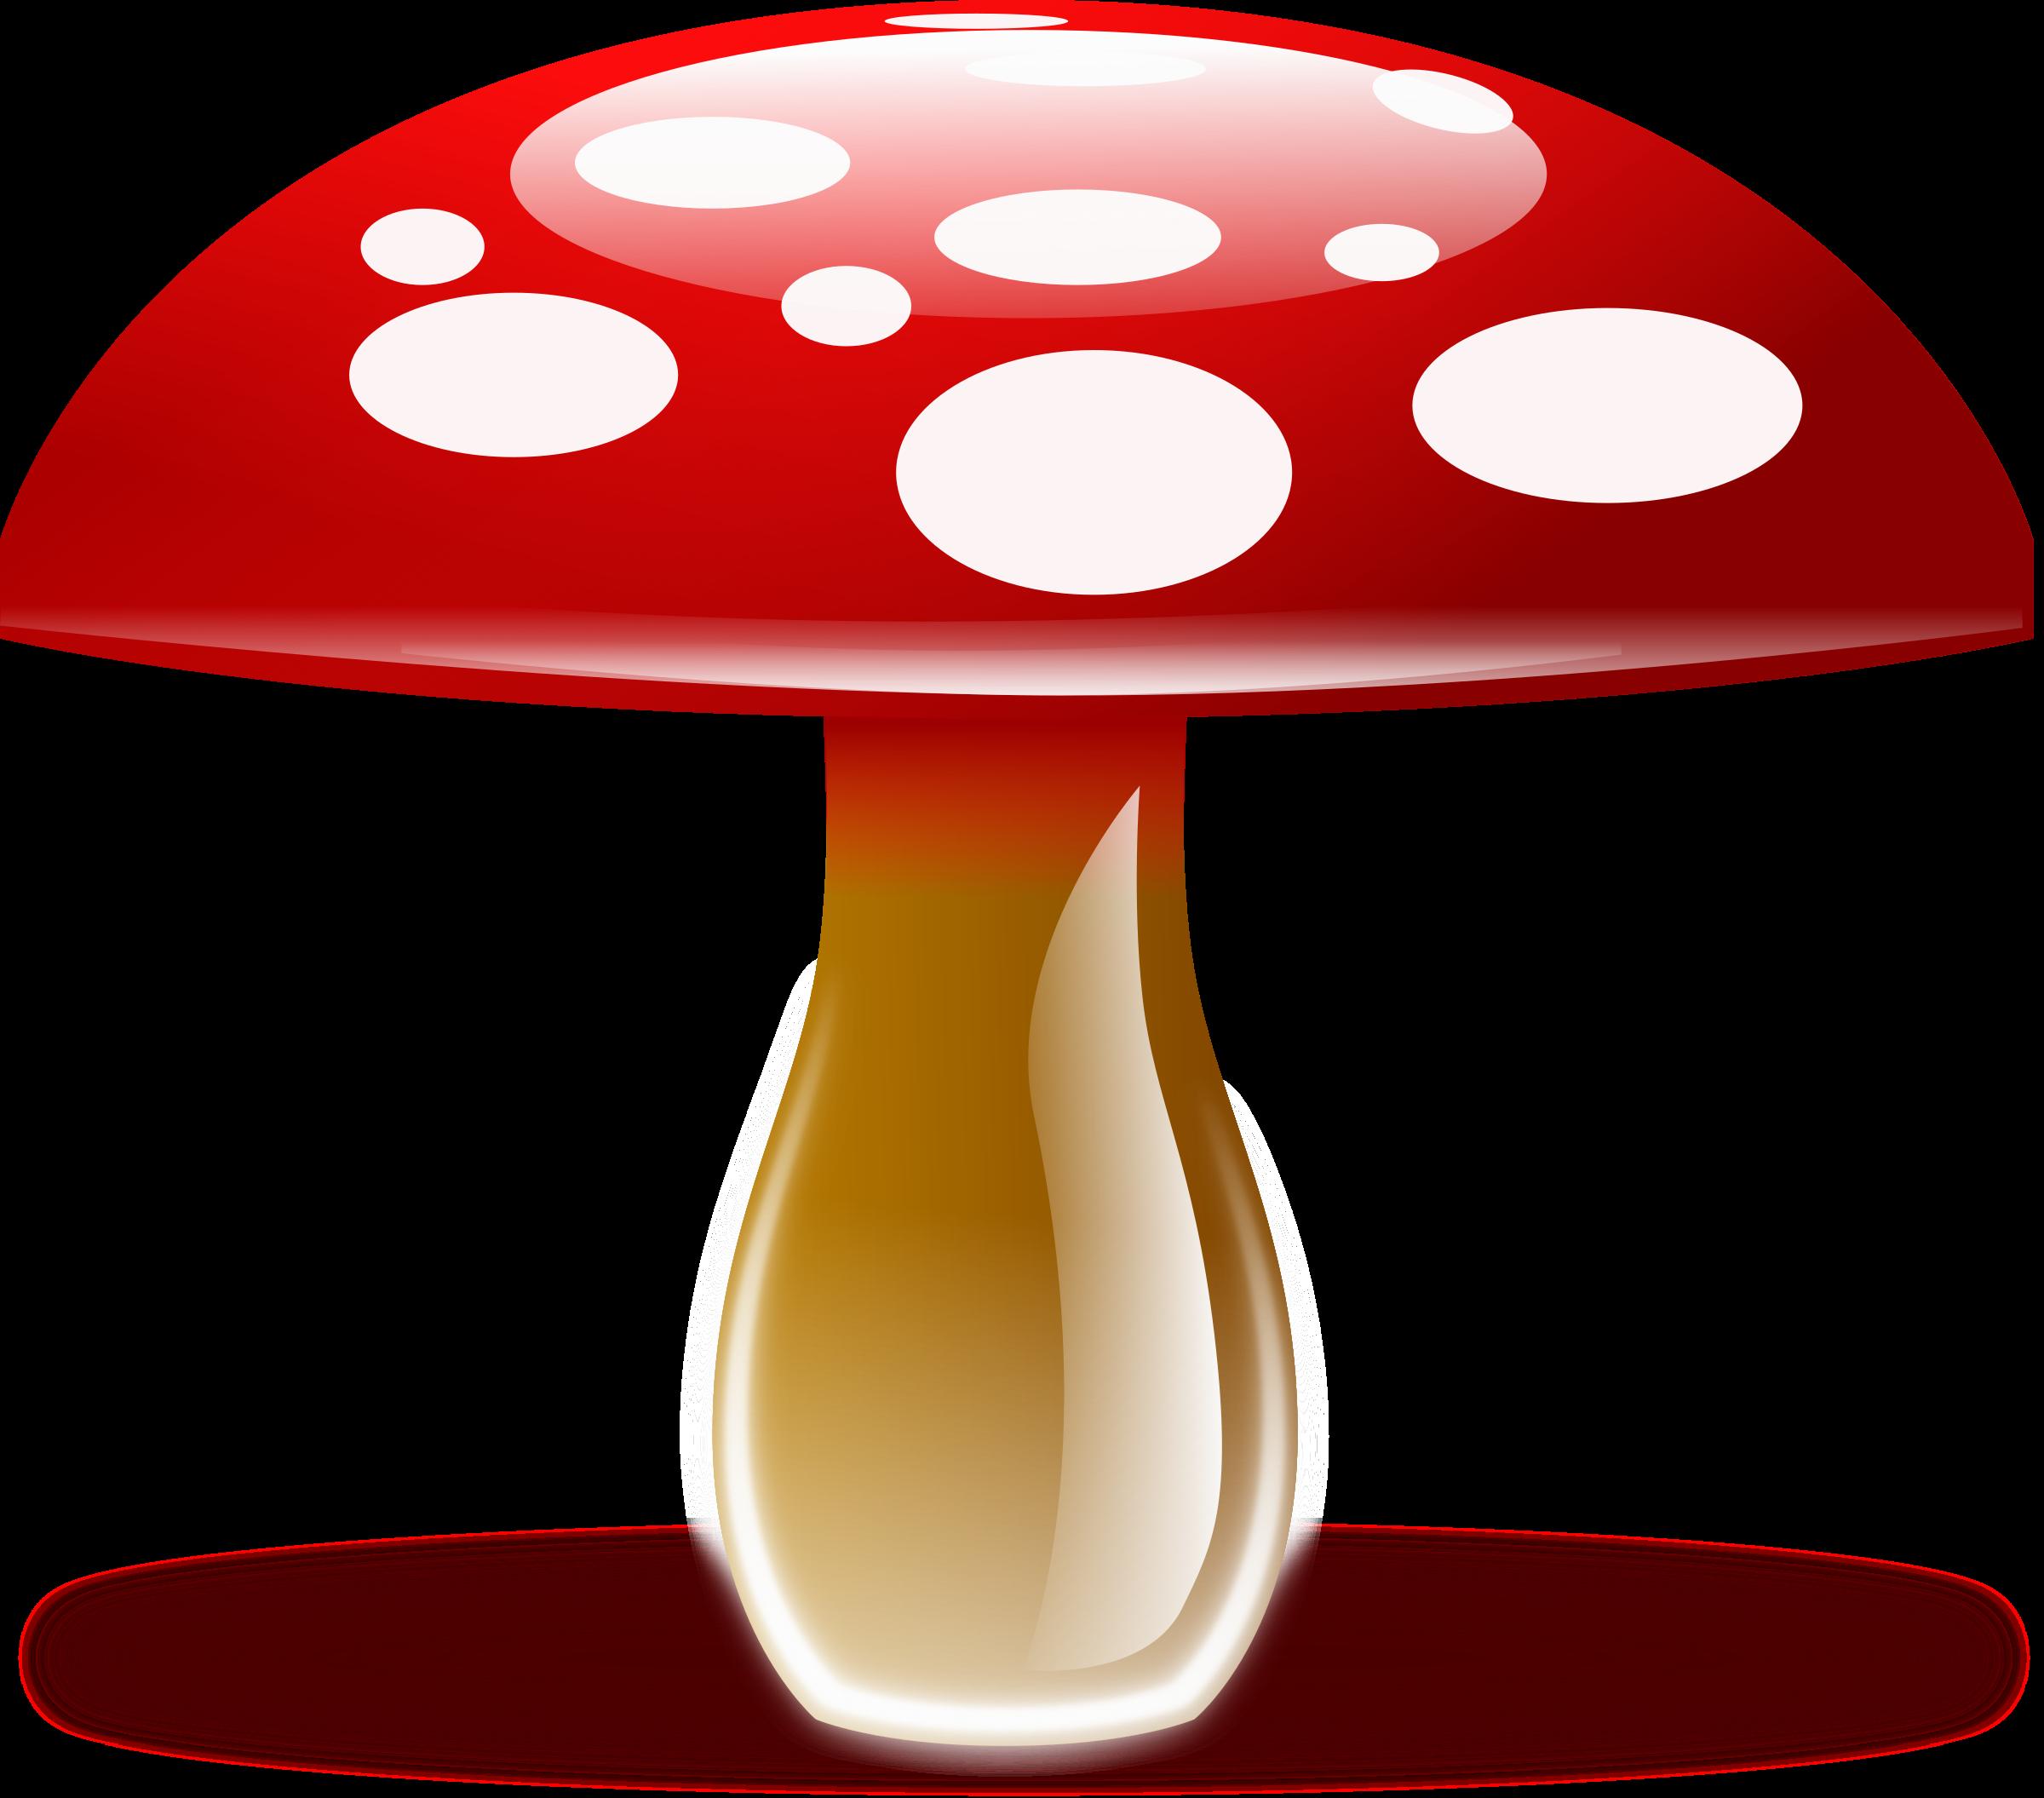 Truffles money clipart svg transparent library mushroom png - Google-søgning | clipart mushrooms | Pinterest svg transparent library